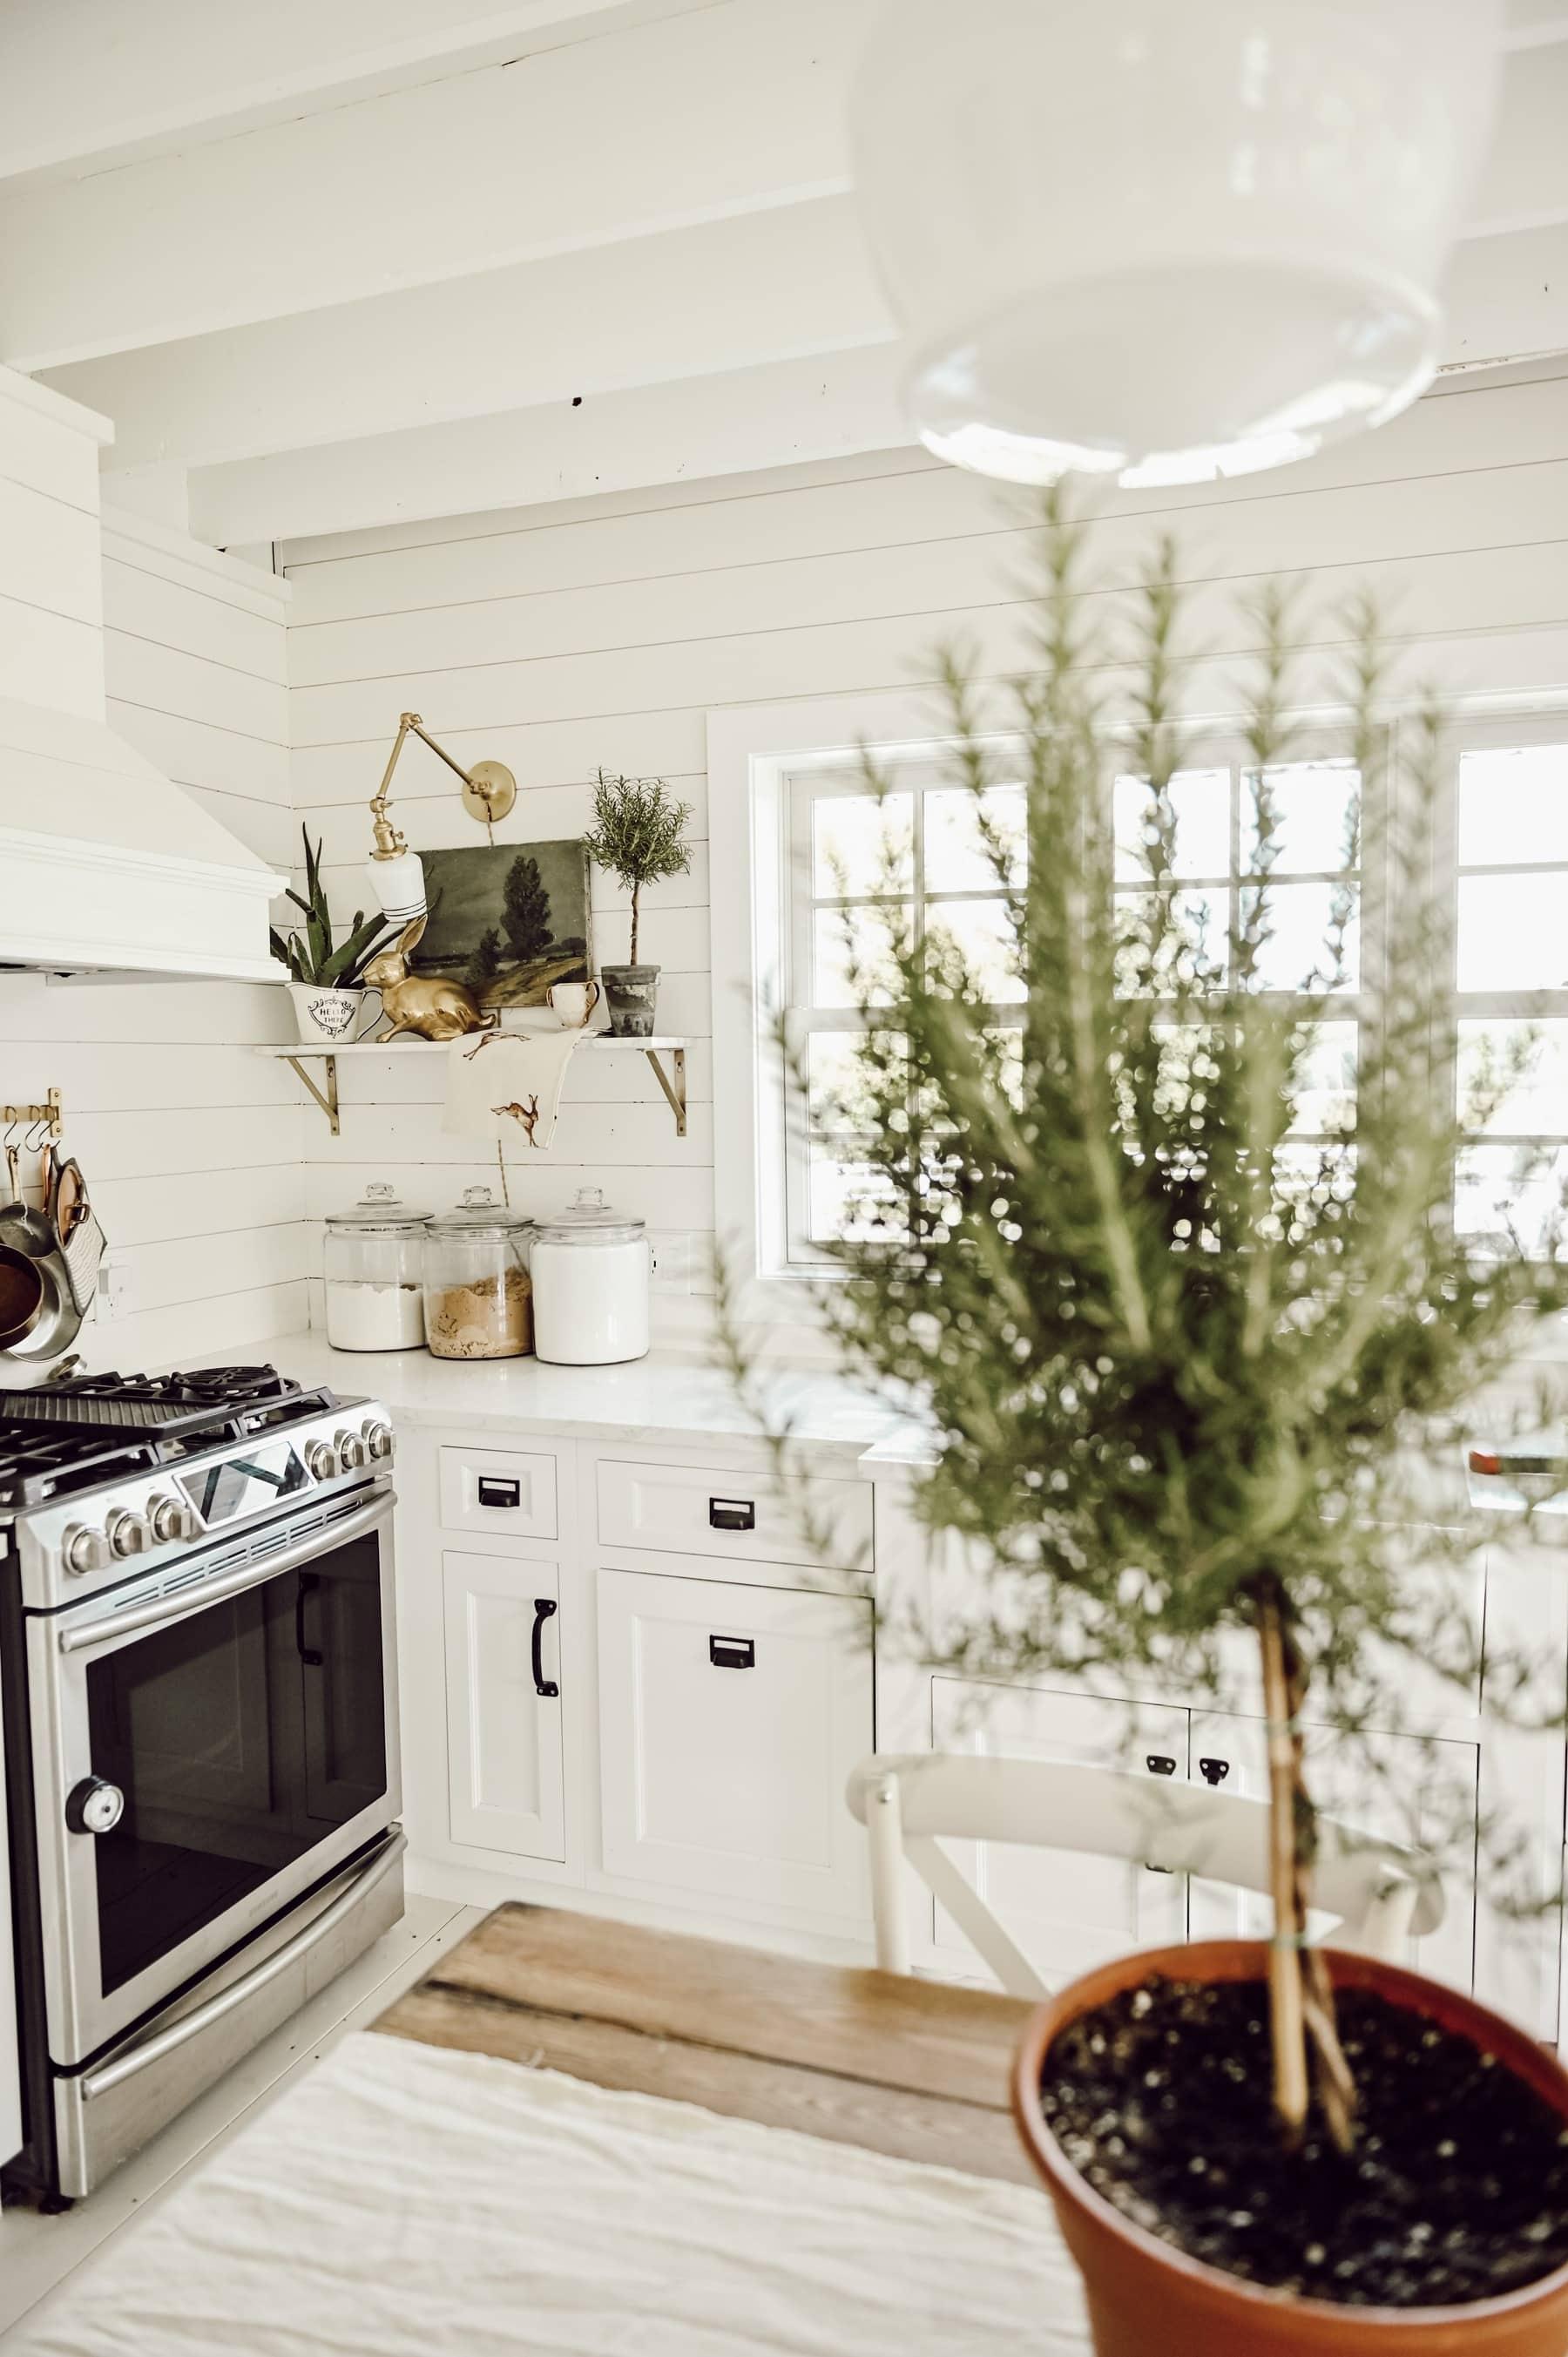 How to Style a Shelf, Shelf Styling Basics: Balance